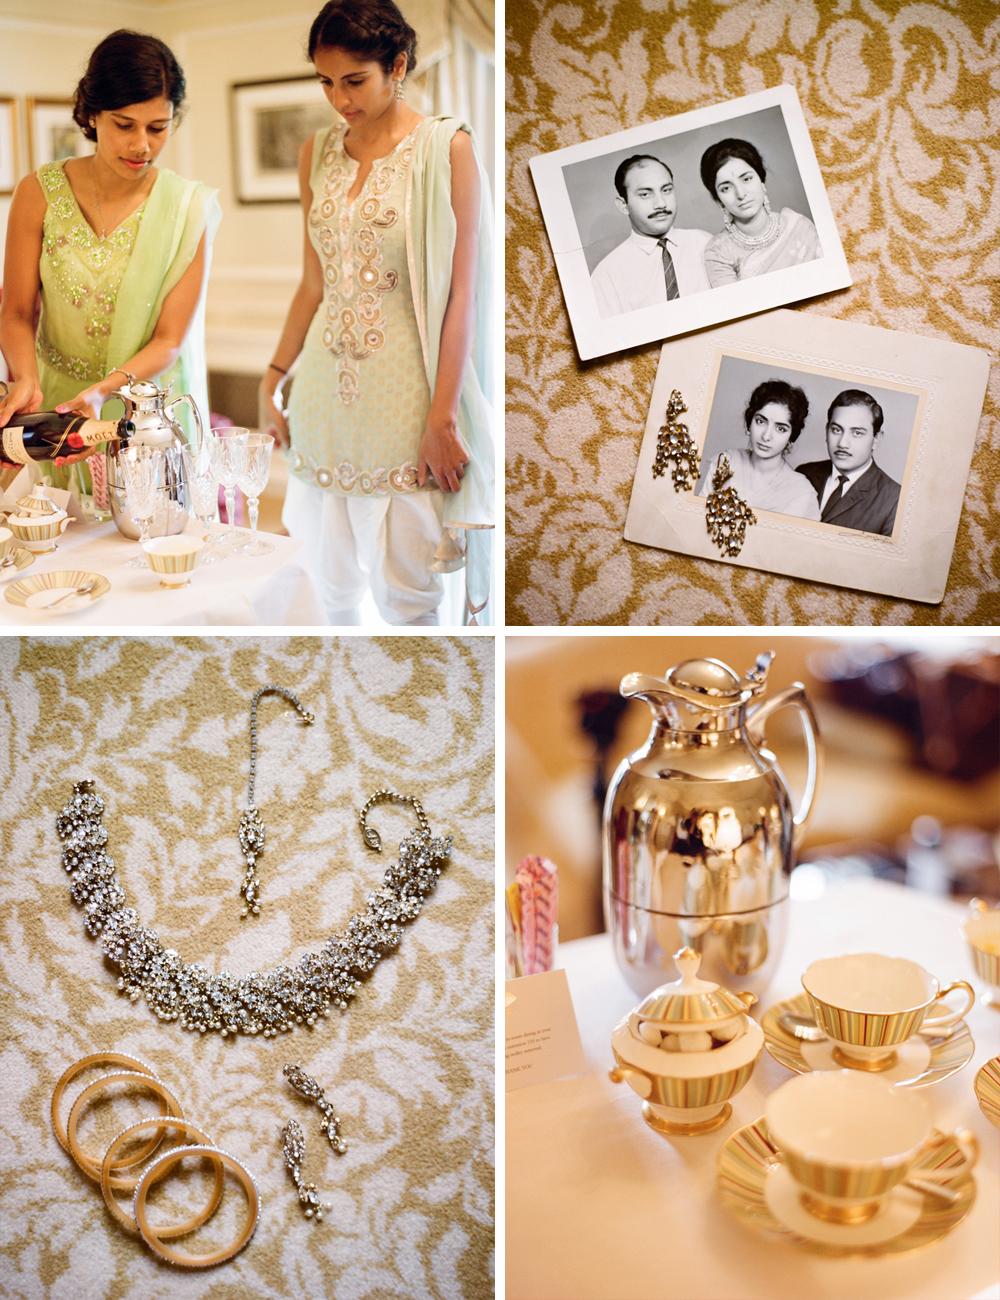 Jewish Hindu multi cultural wedding at the Mandarin Oriental London 6